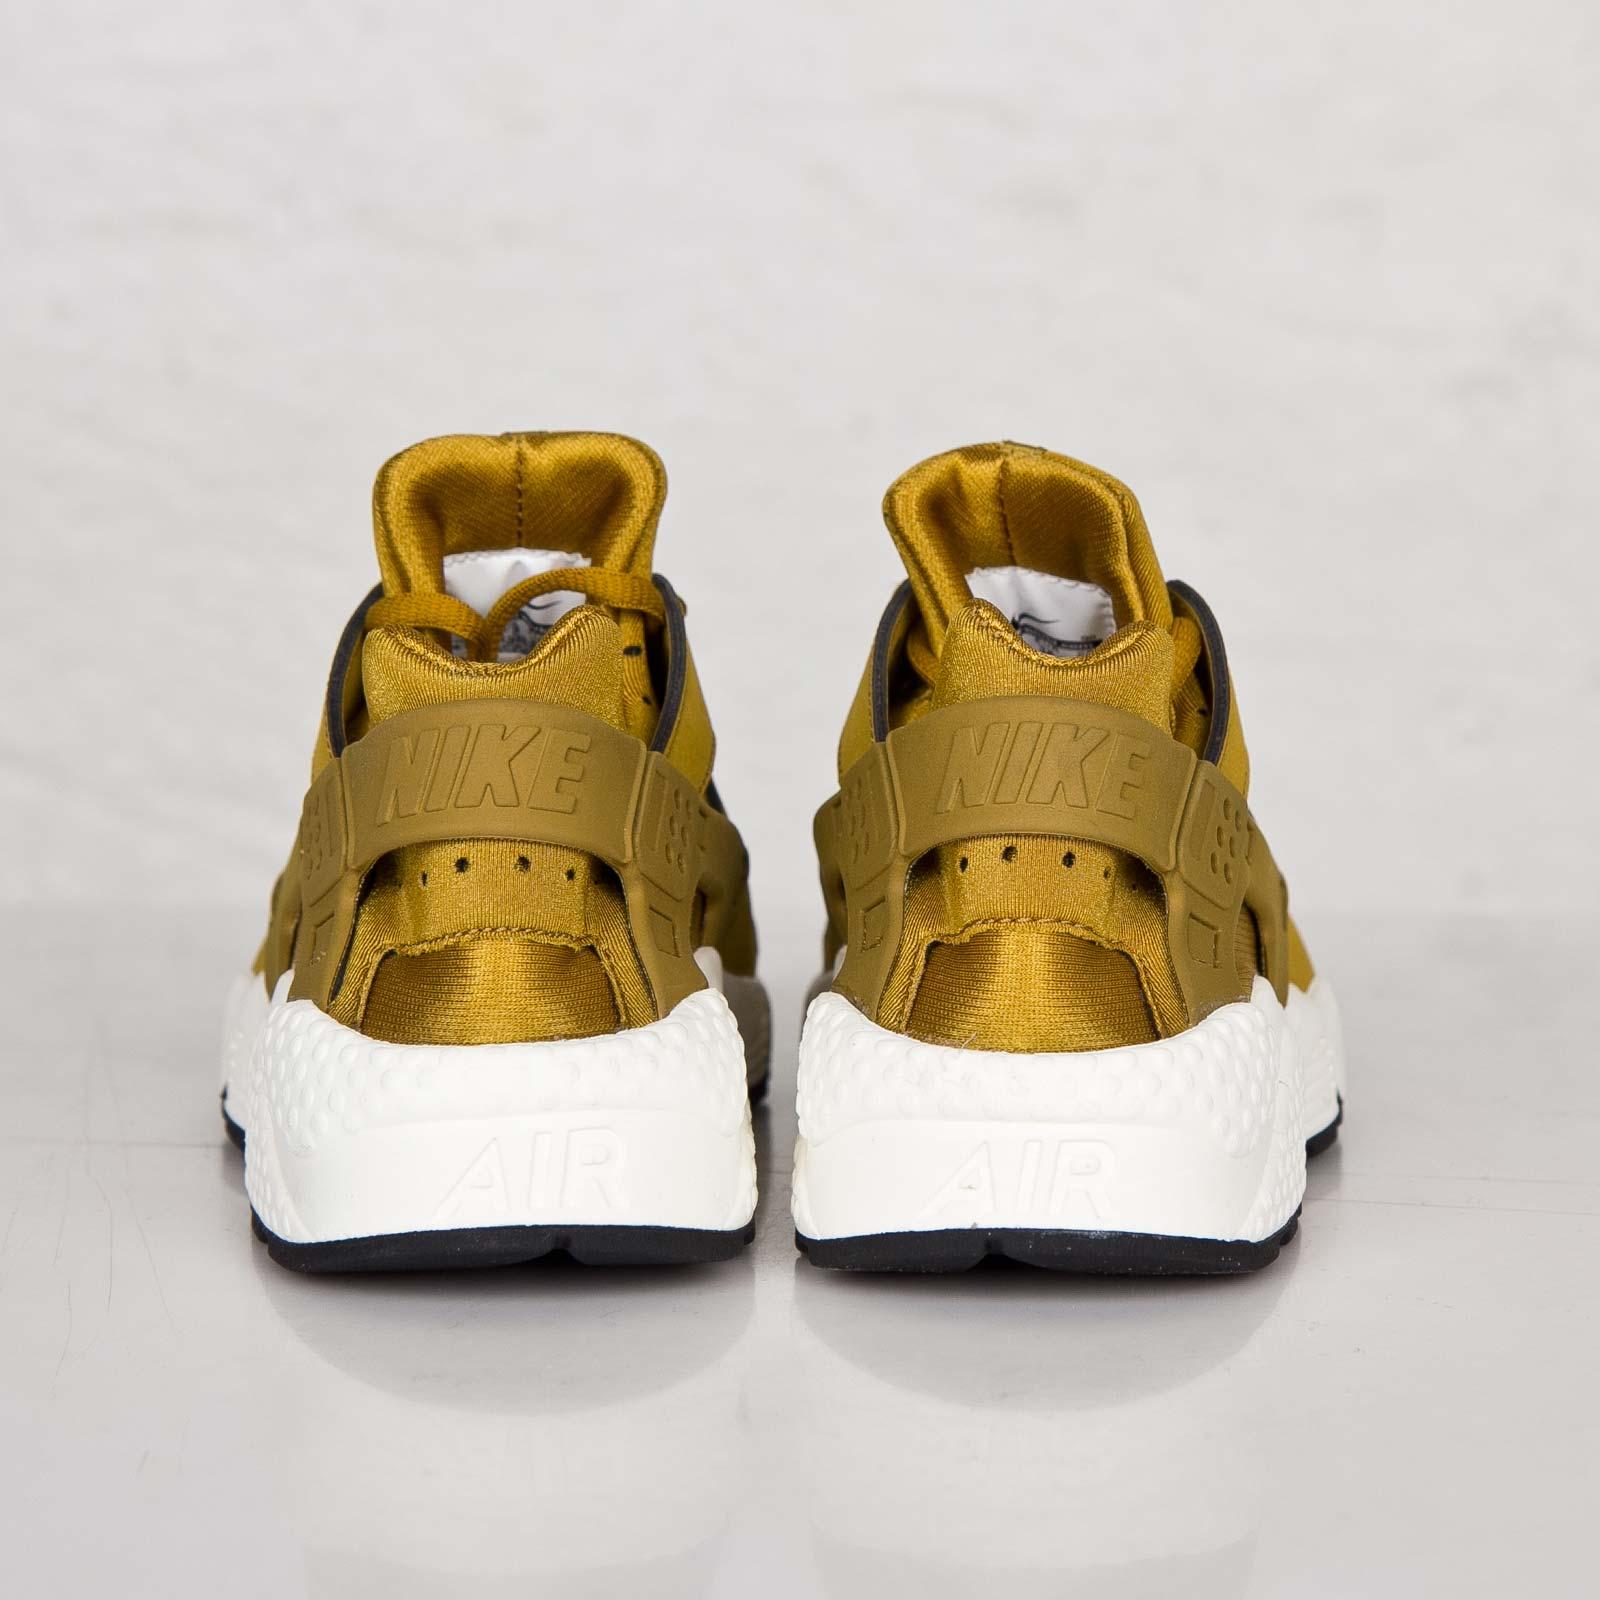 1330f9a6ca6d Nike Wmns Air Huarache Run - 634835-700 - Sneakersnstuff